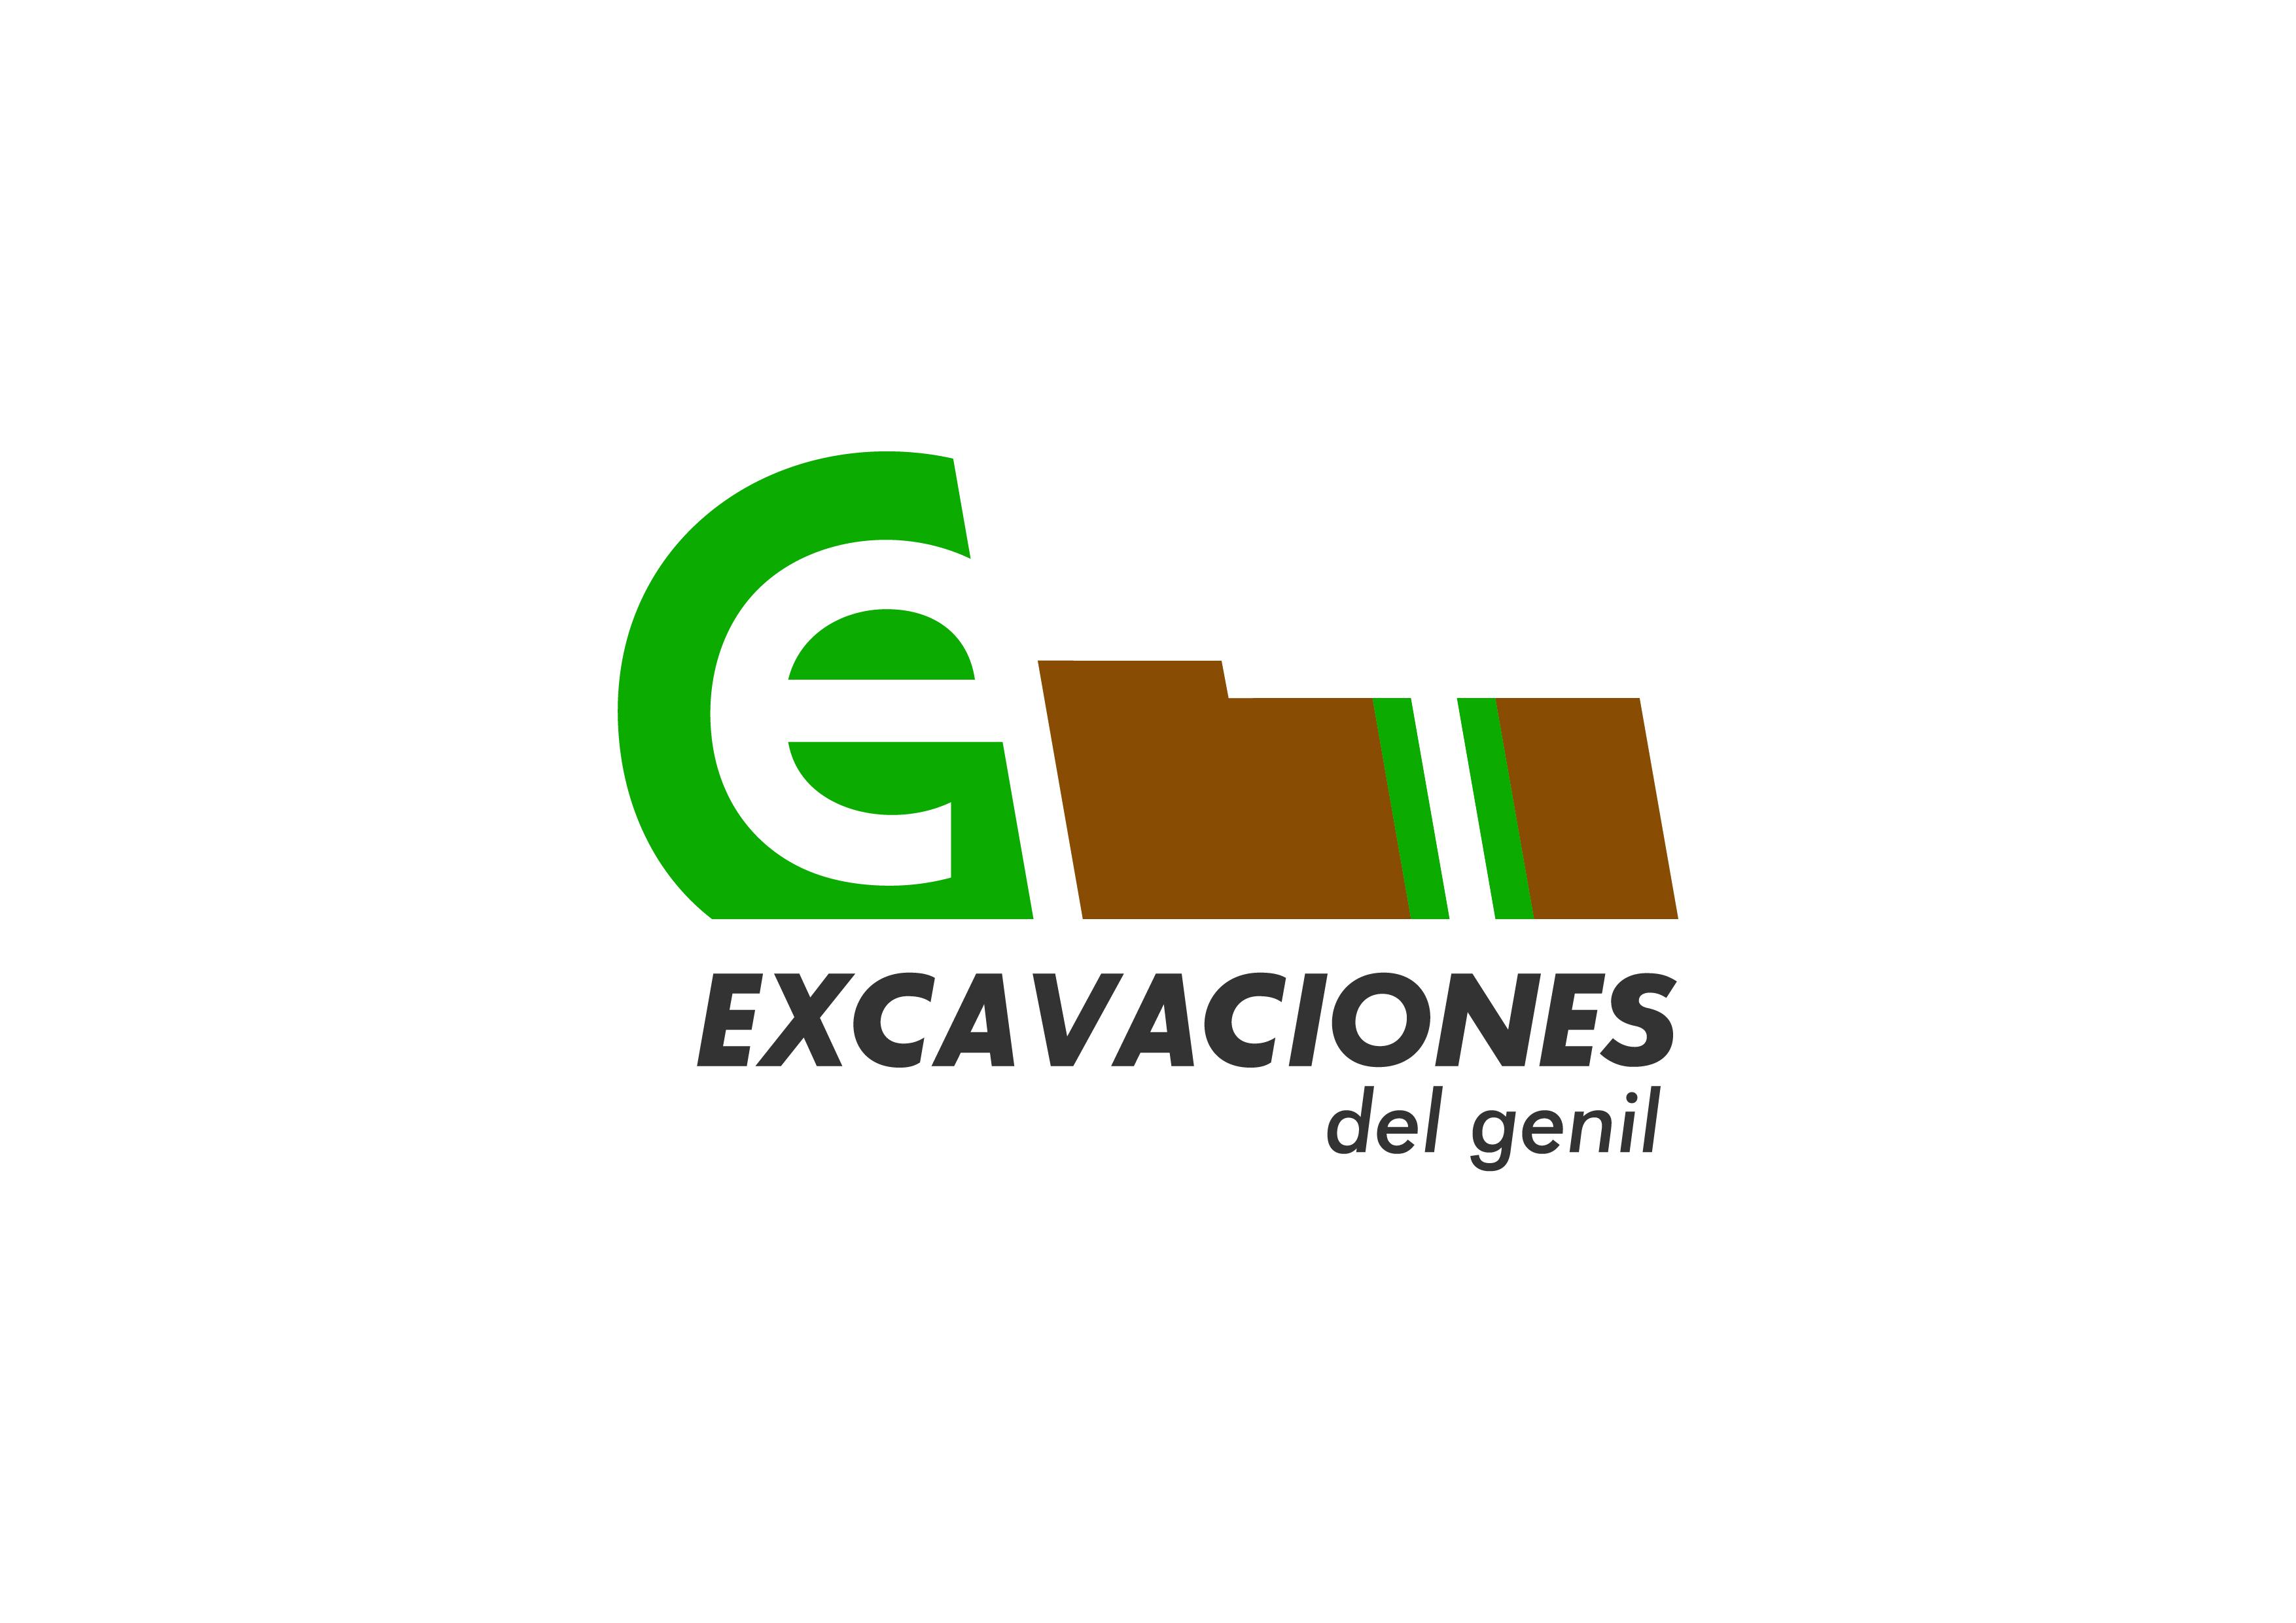 Excavaciones Del Genil S.l.